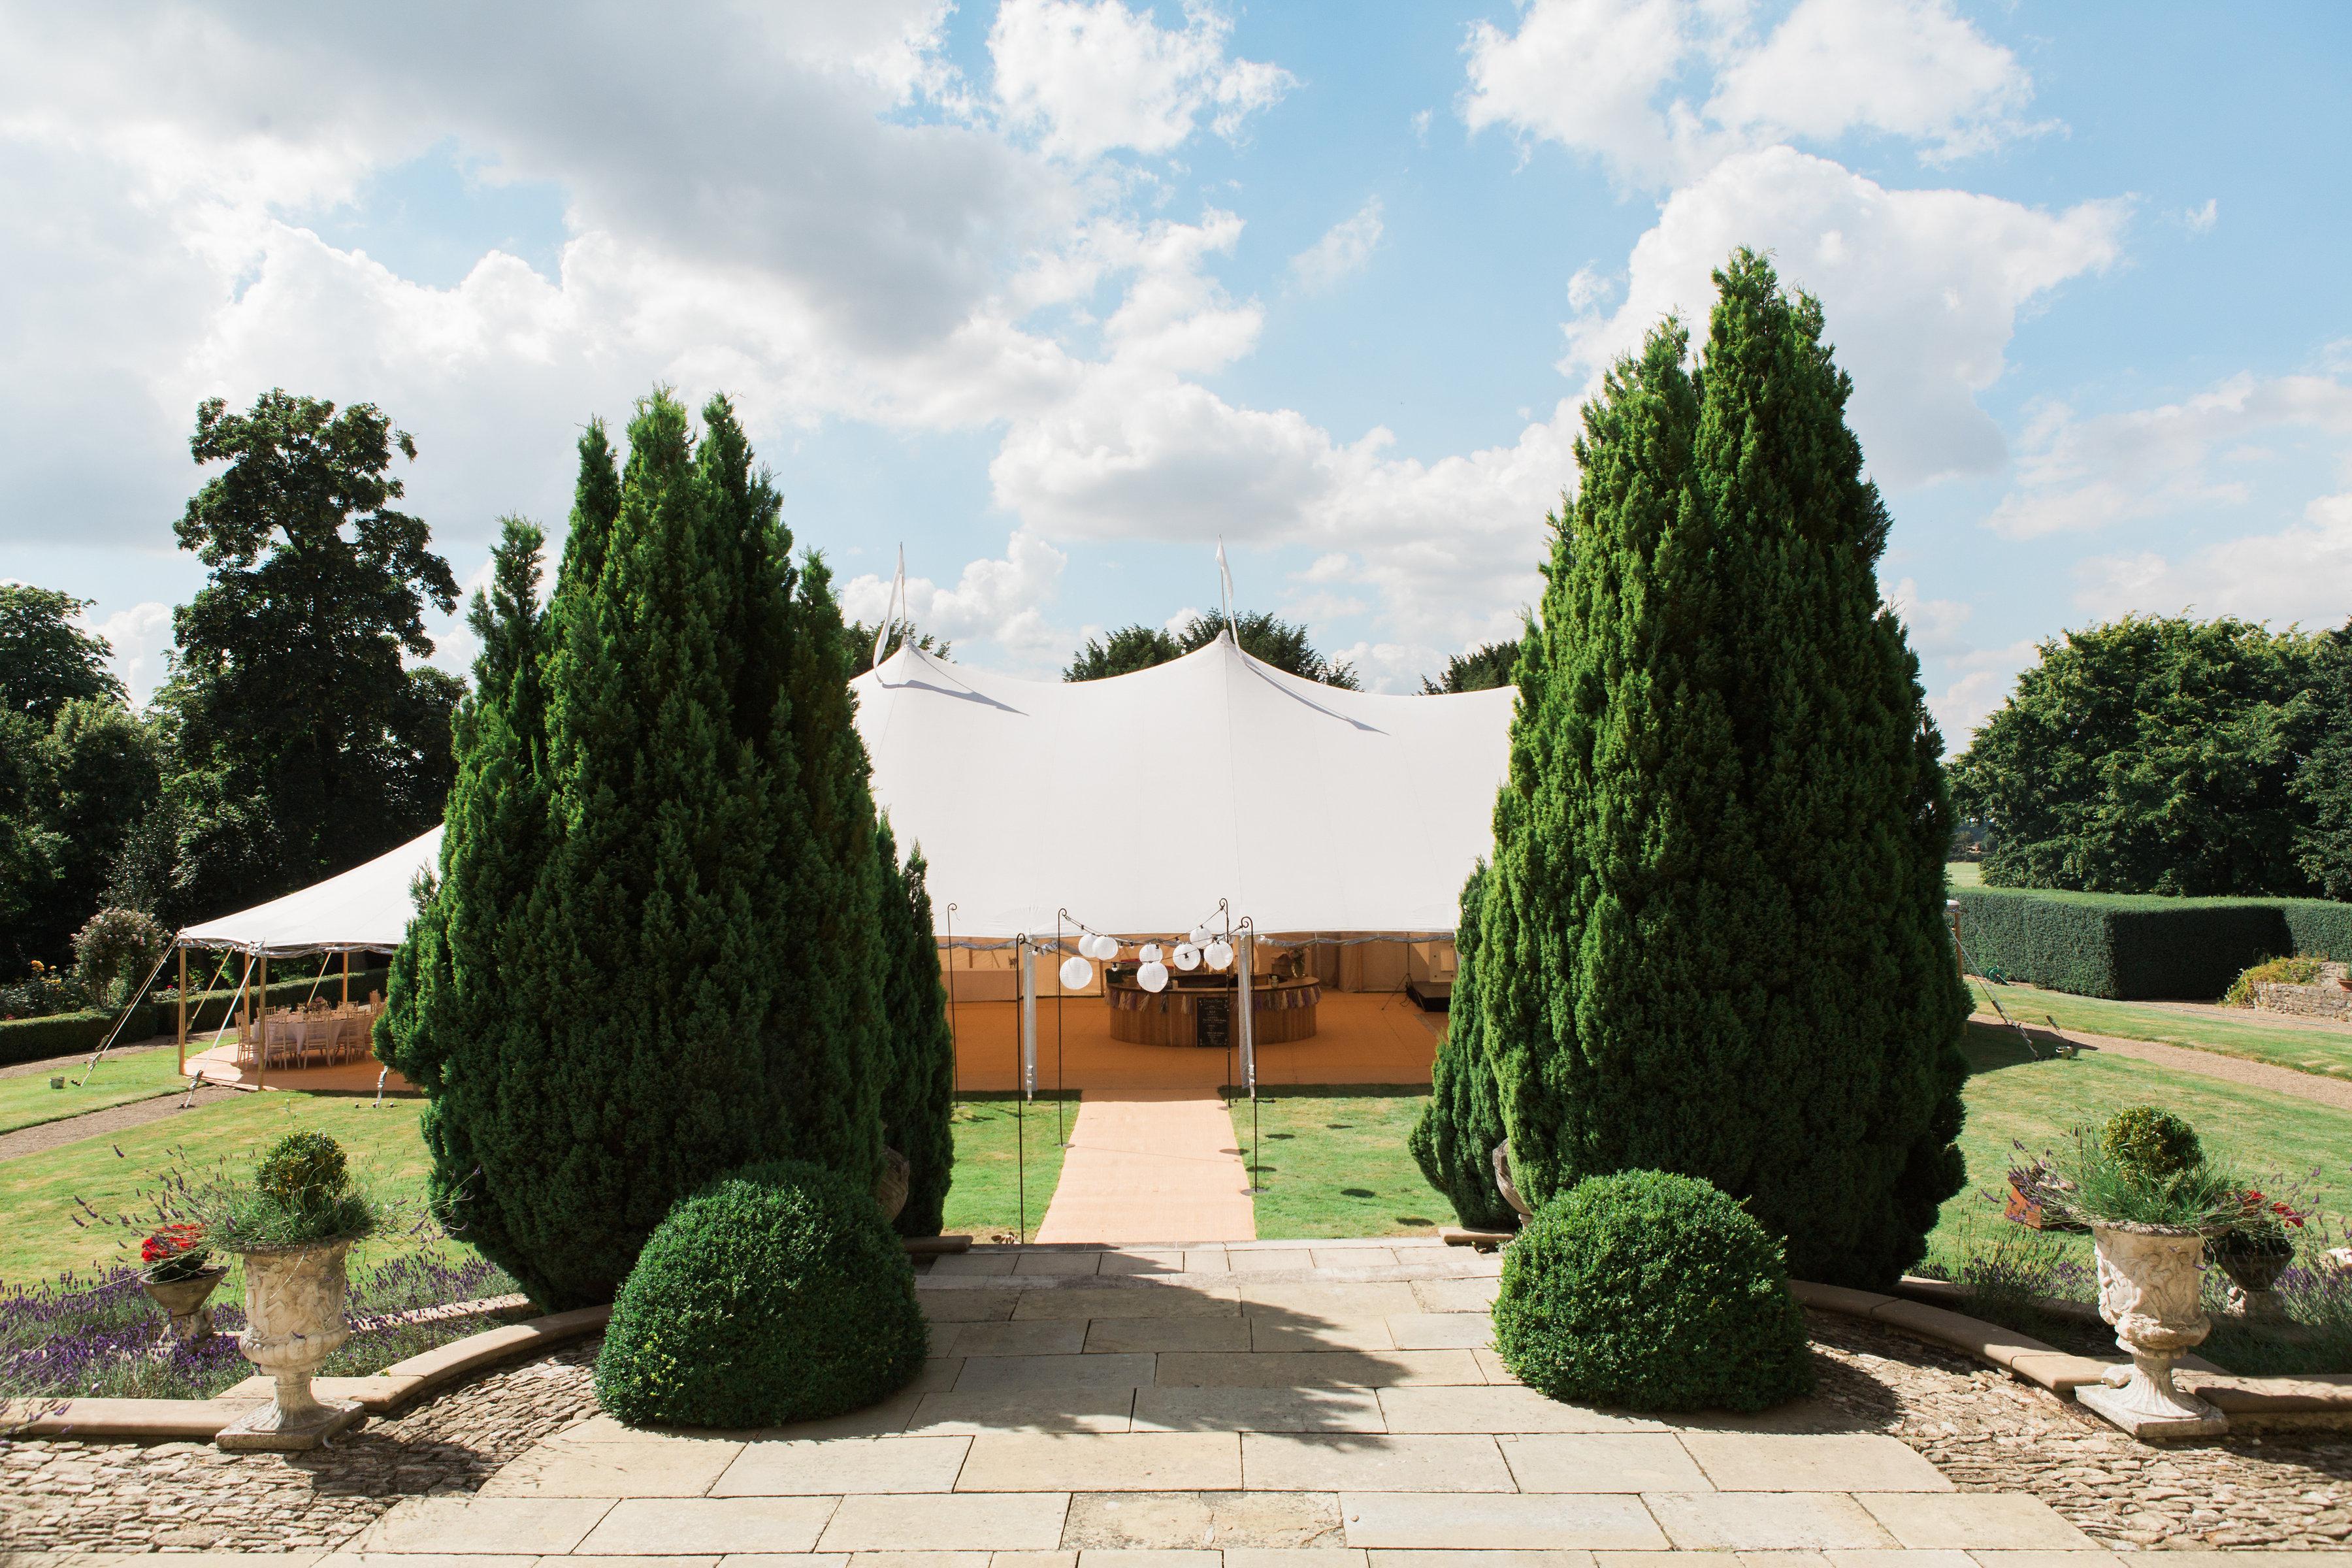 Georgie & Ben's PapaKåta Sperry Tent wedding at Newington House captured by Lucy Davenport: Sperry Tent Reception Space